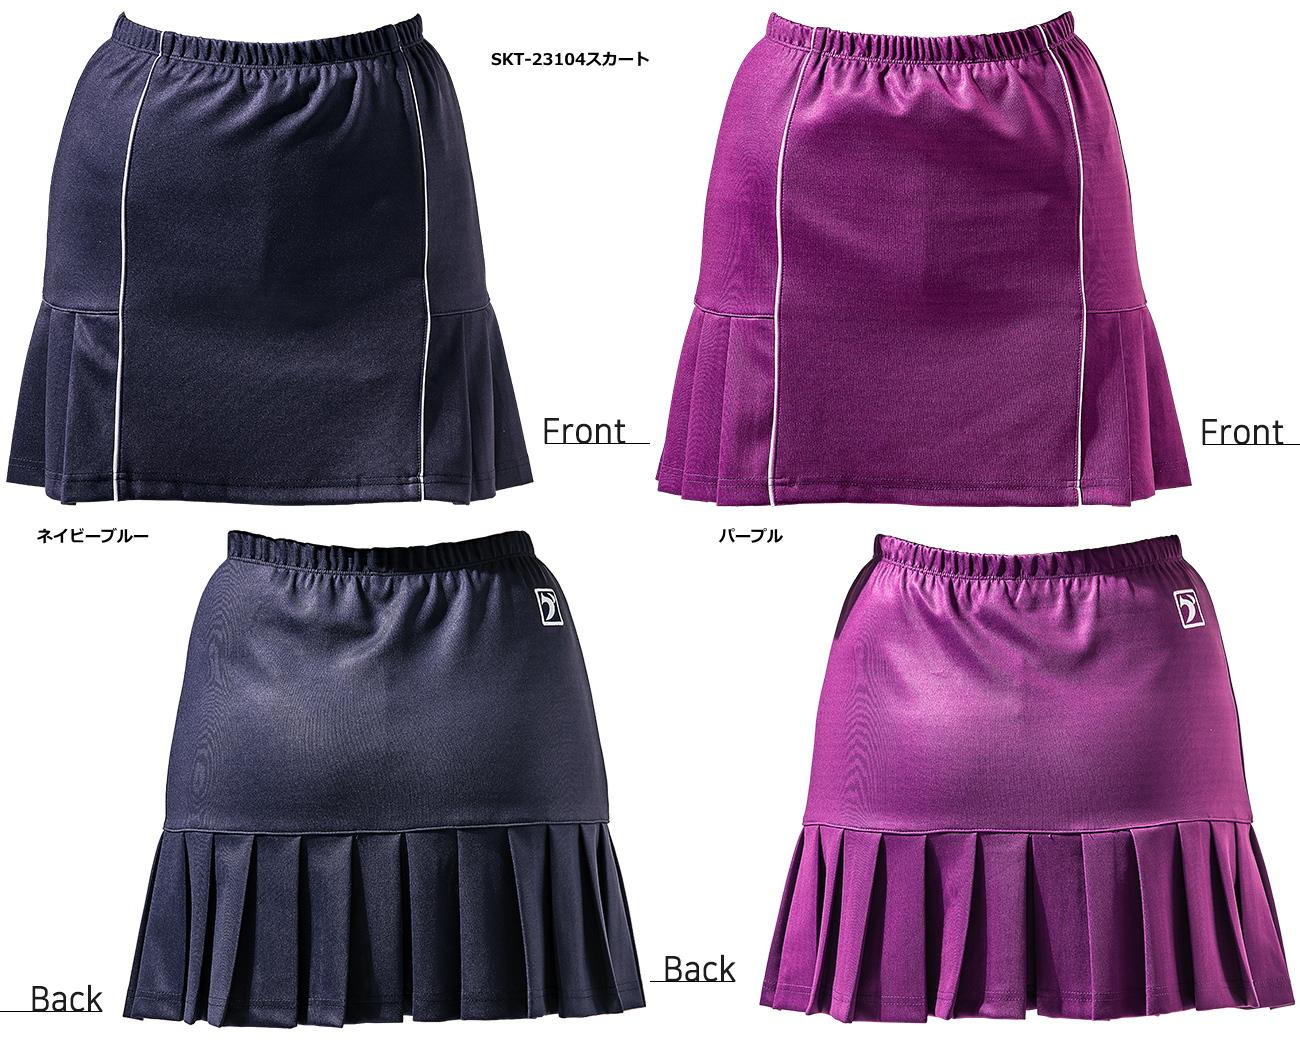 【SSOSIO お取り寄せ】 ソシオSKT-23104 ボウリングスカート